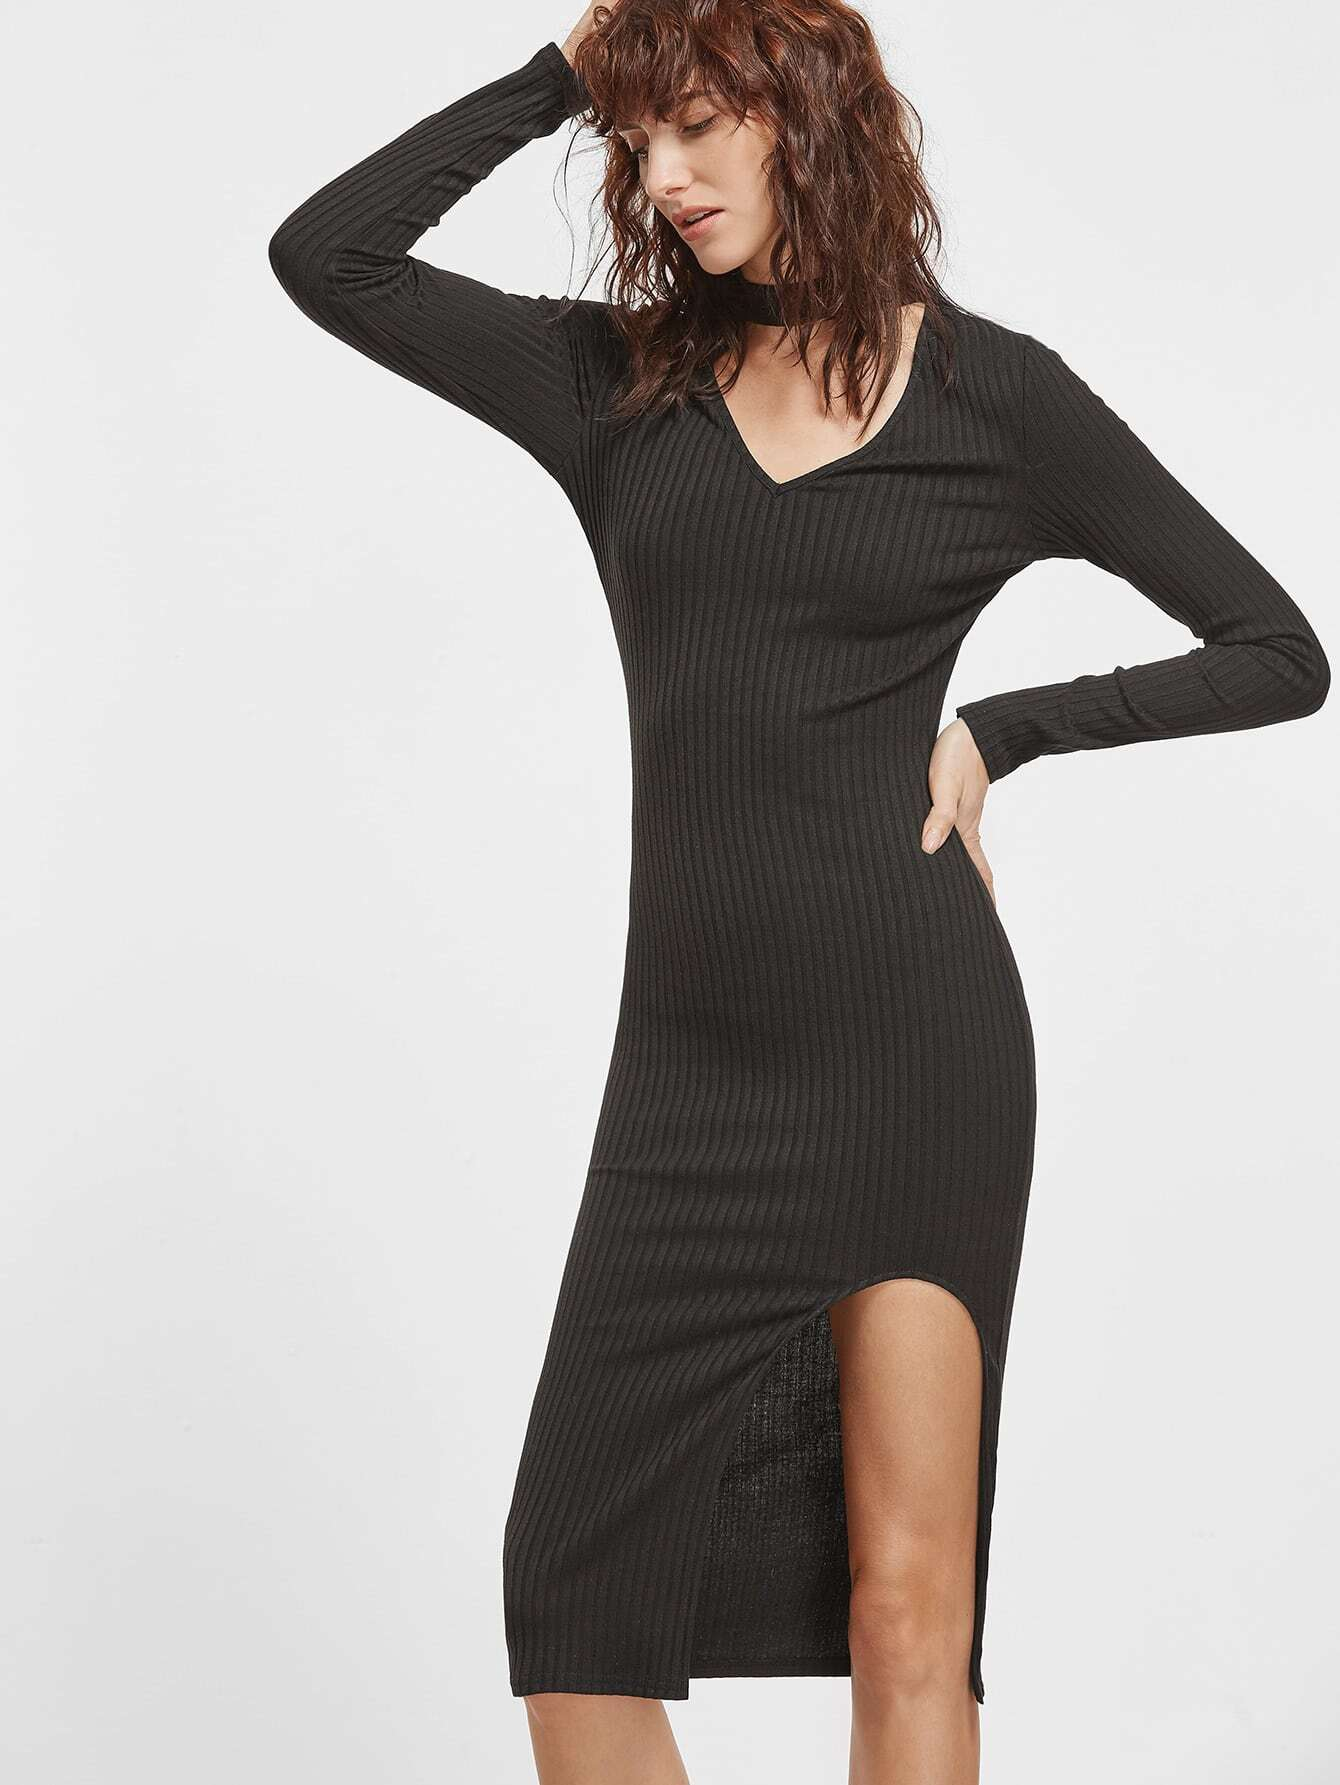 Black Cutout Choker Neck Split Front Ribbed Pencil Dress dress161202725